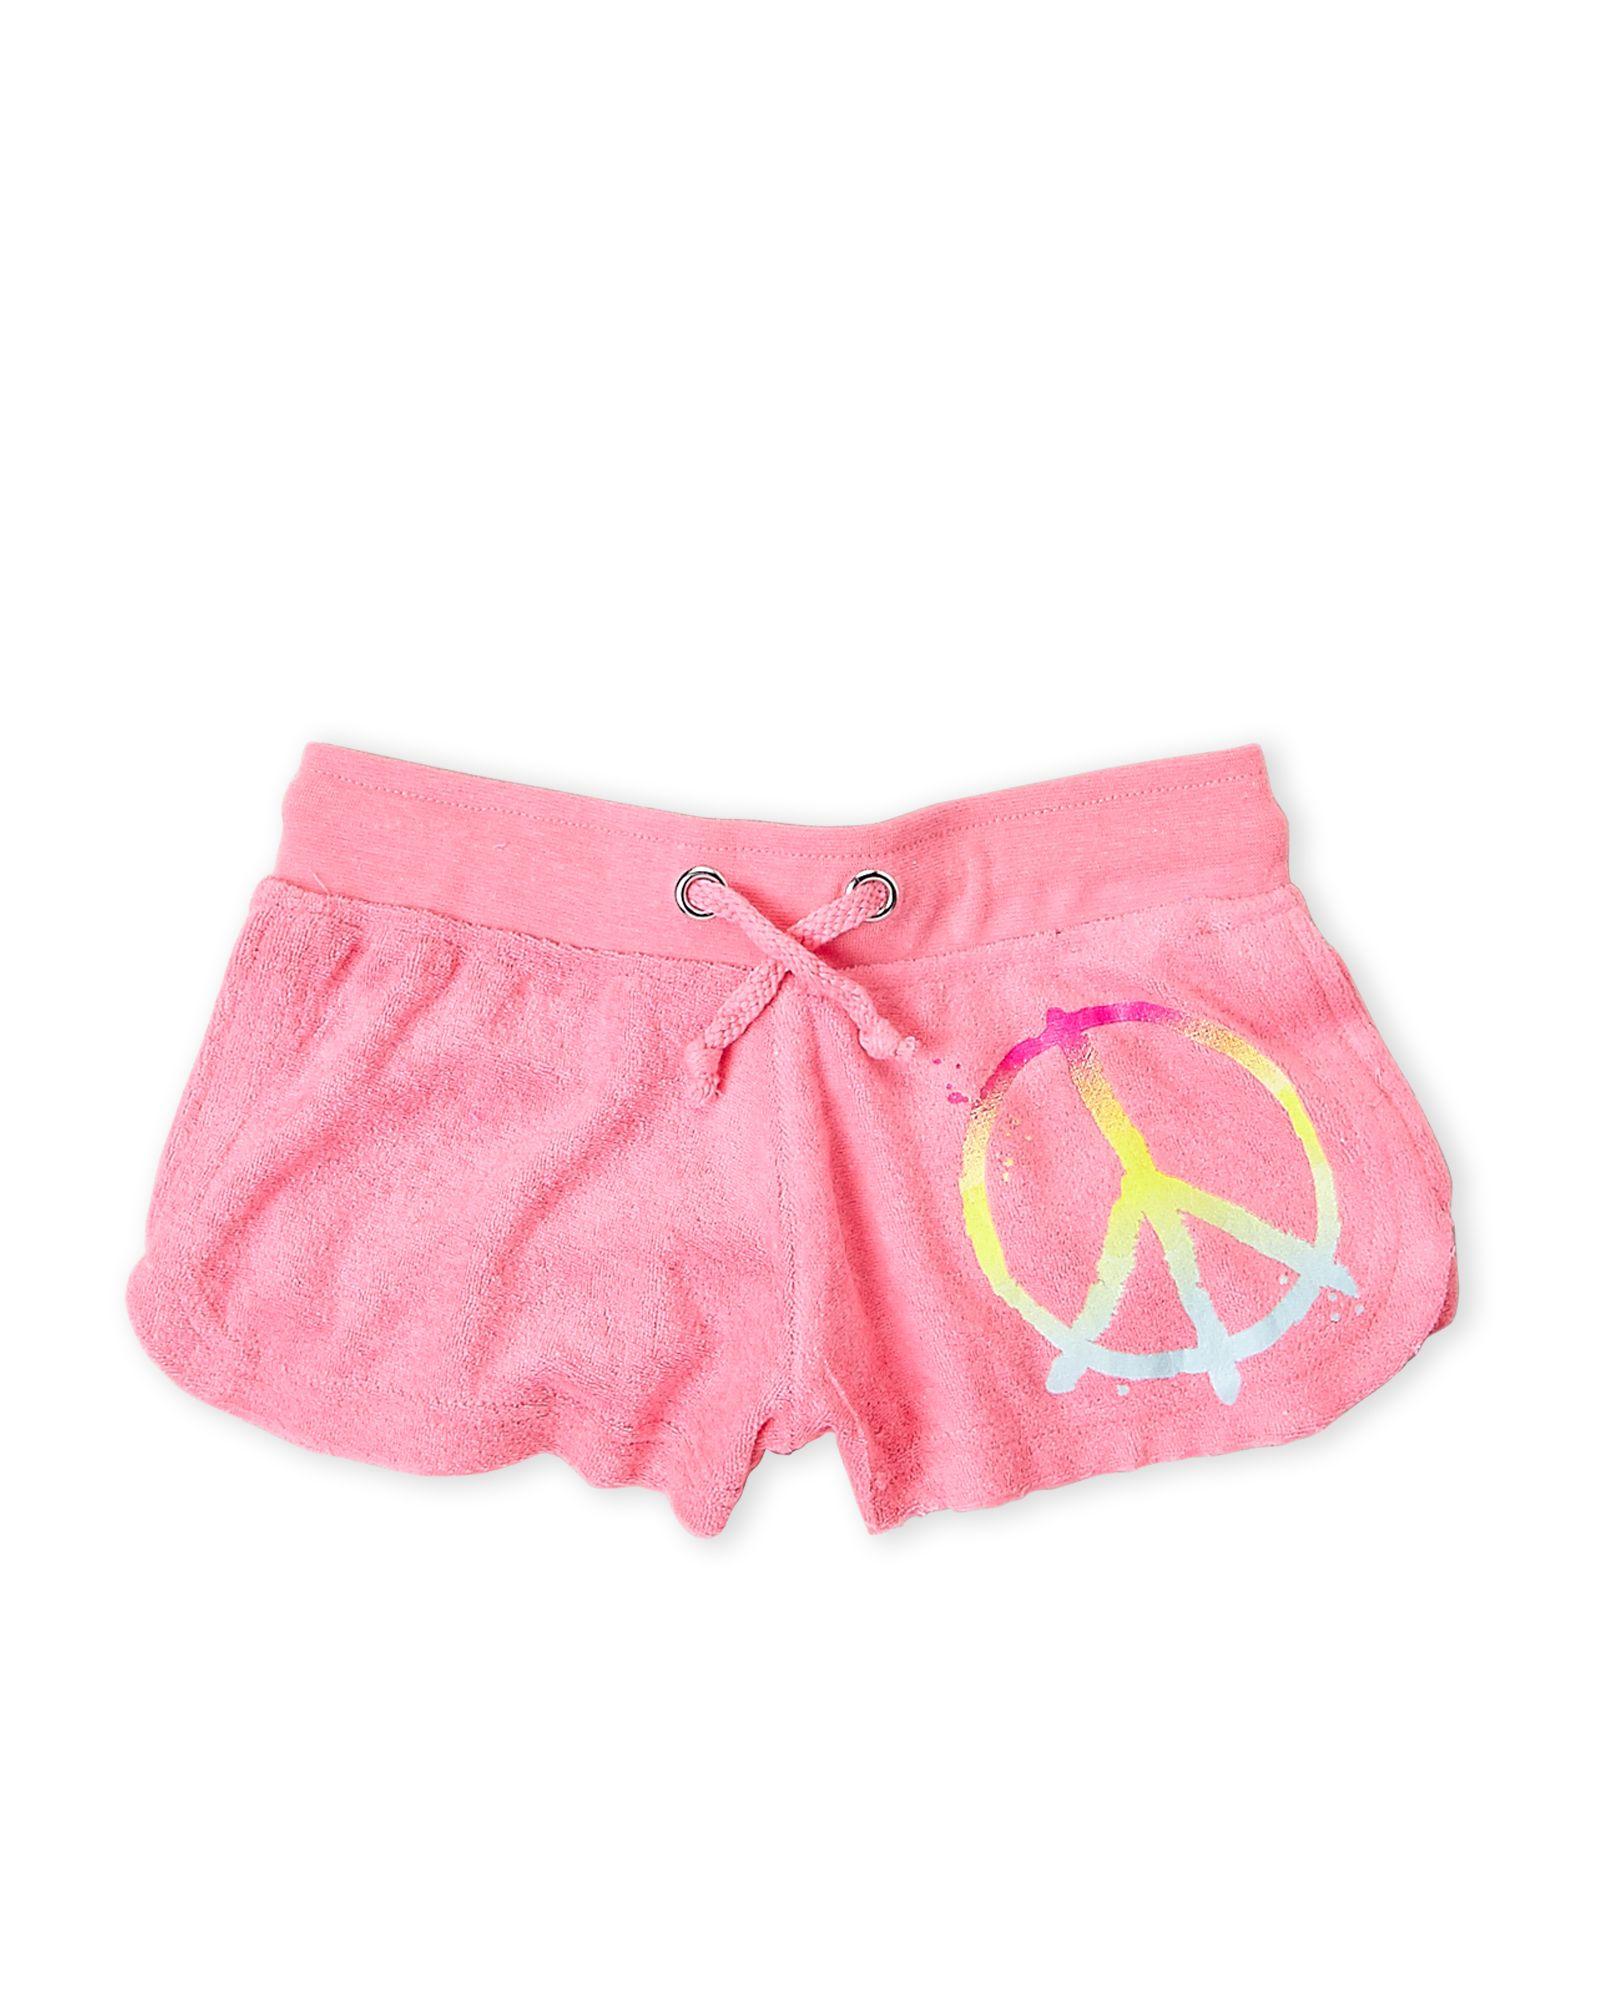 Girls terry cloth shorts apparel u accessories pinterest